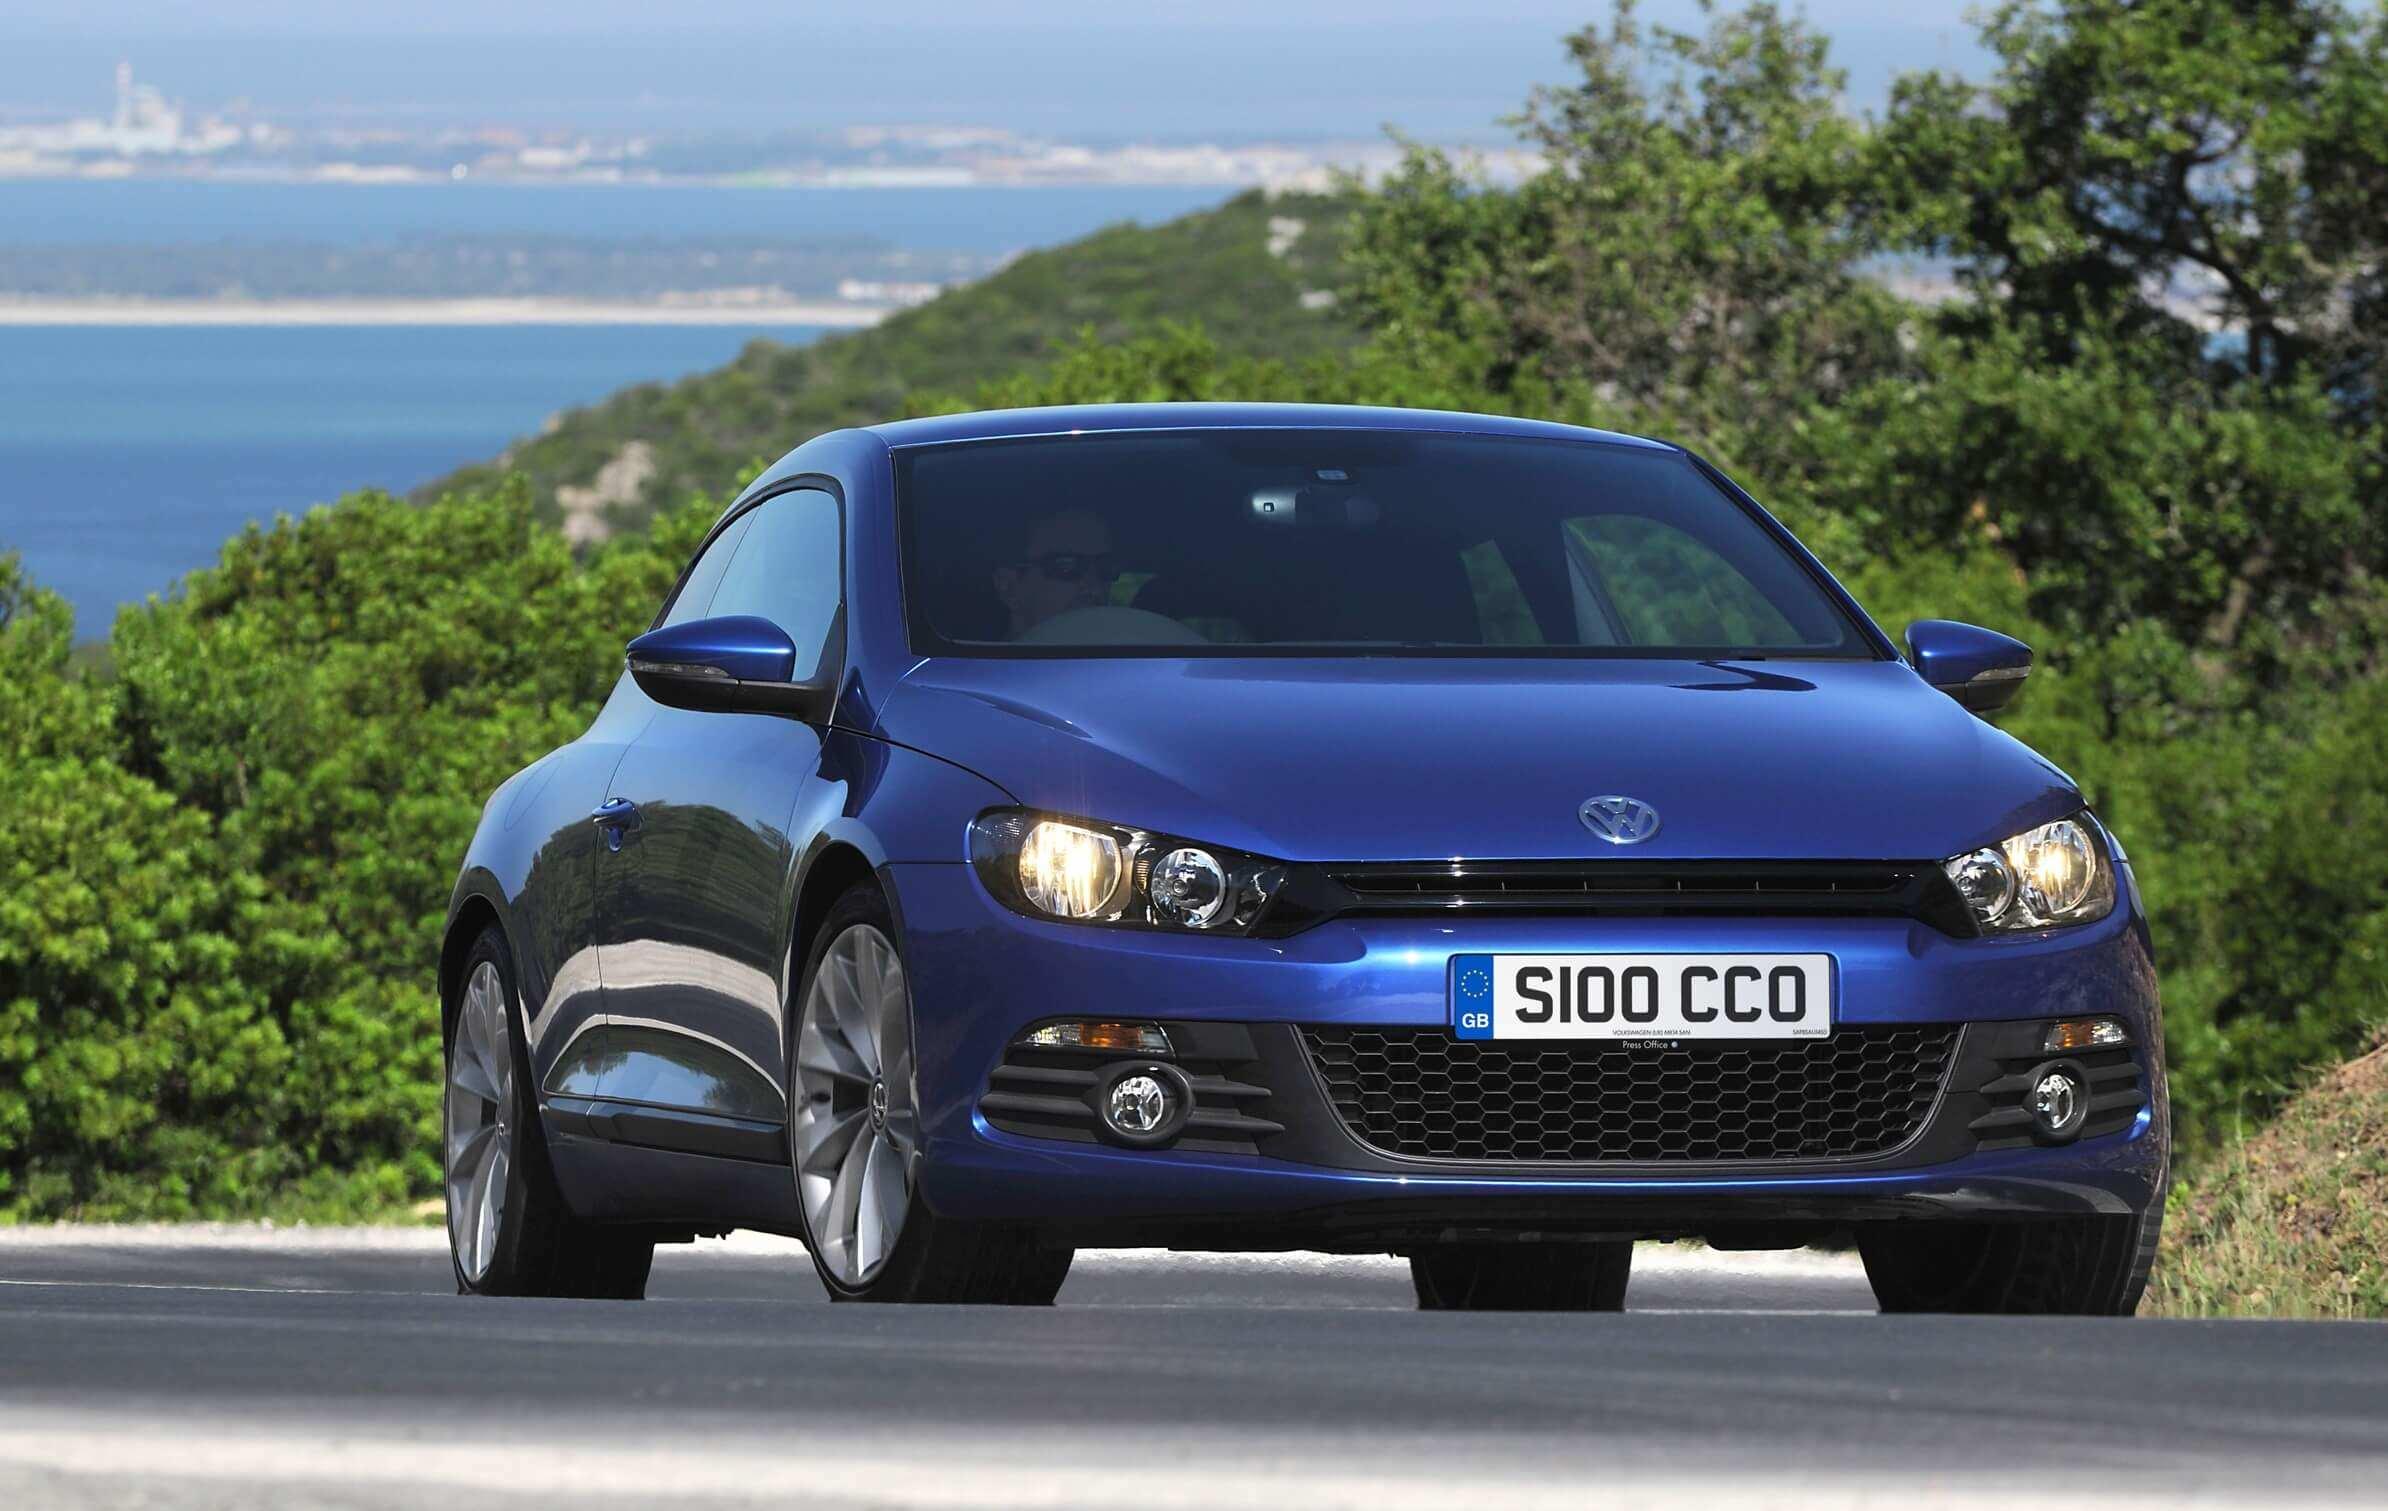 Blue Volkswagen Scirocco coupe